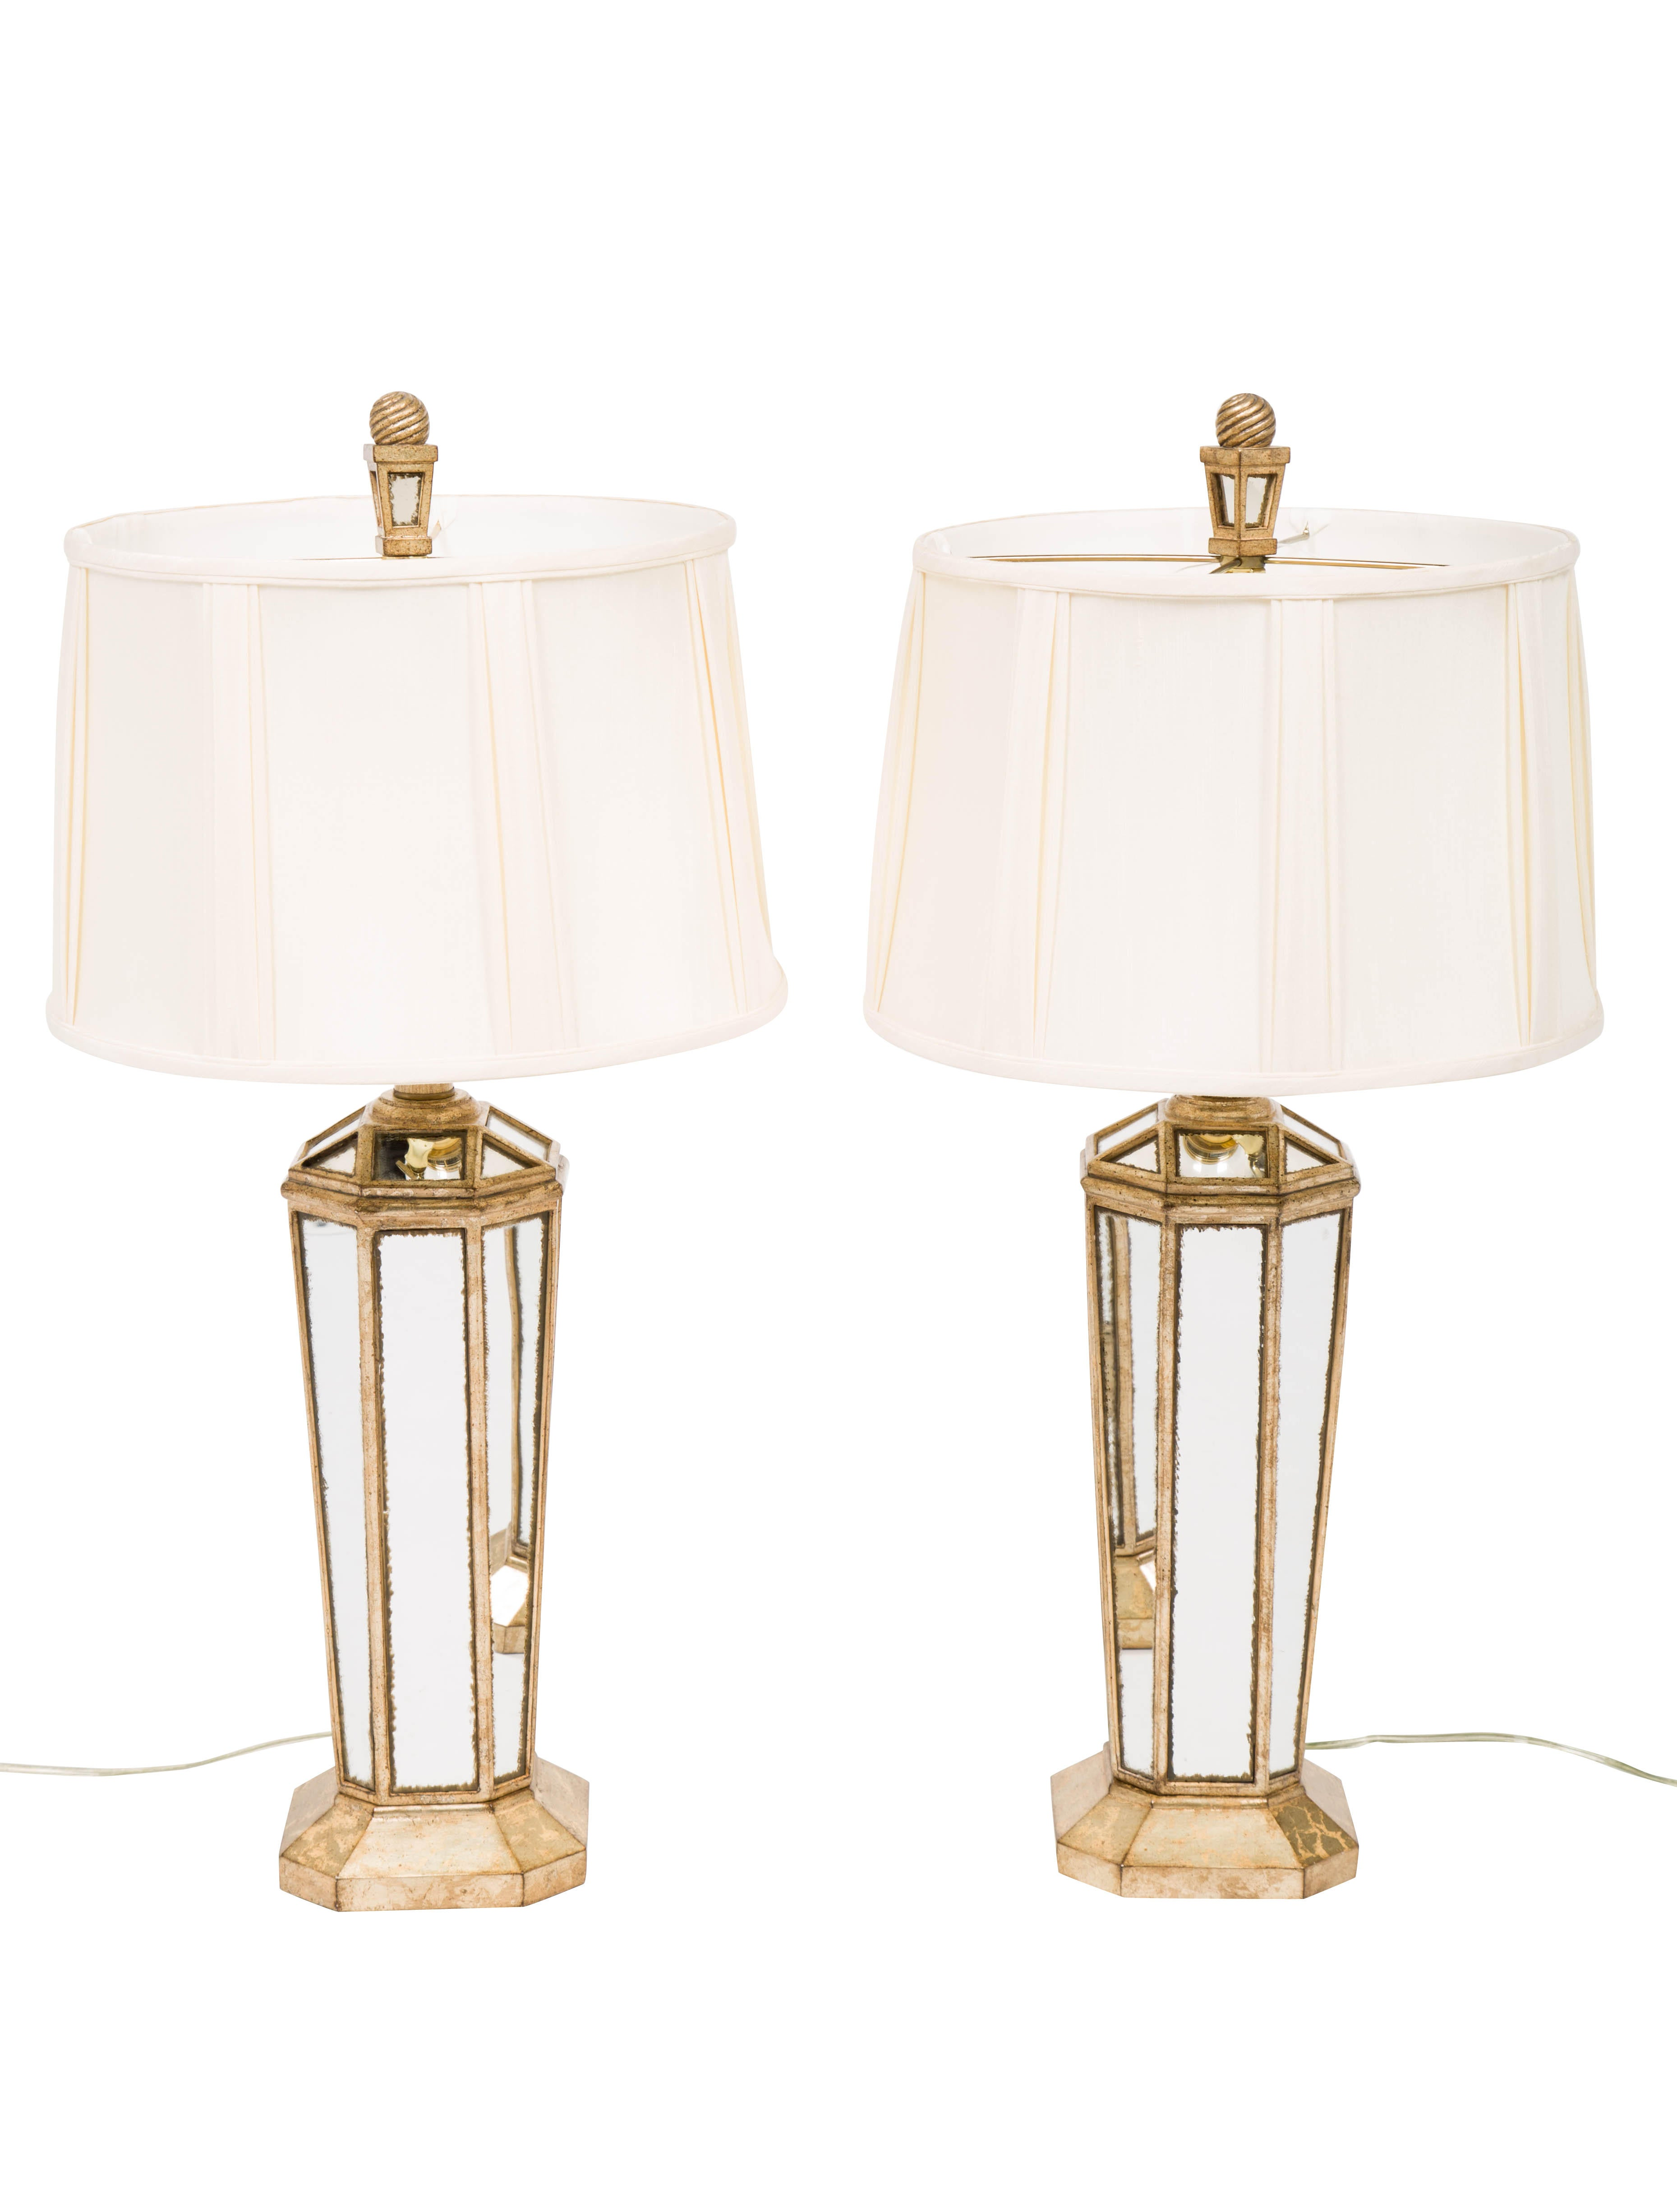 Alexander John Table Lamps